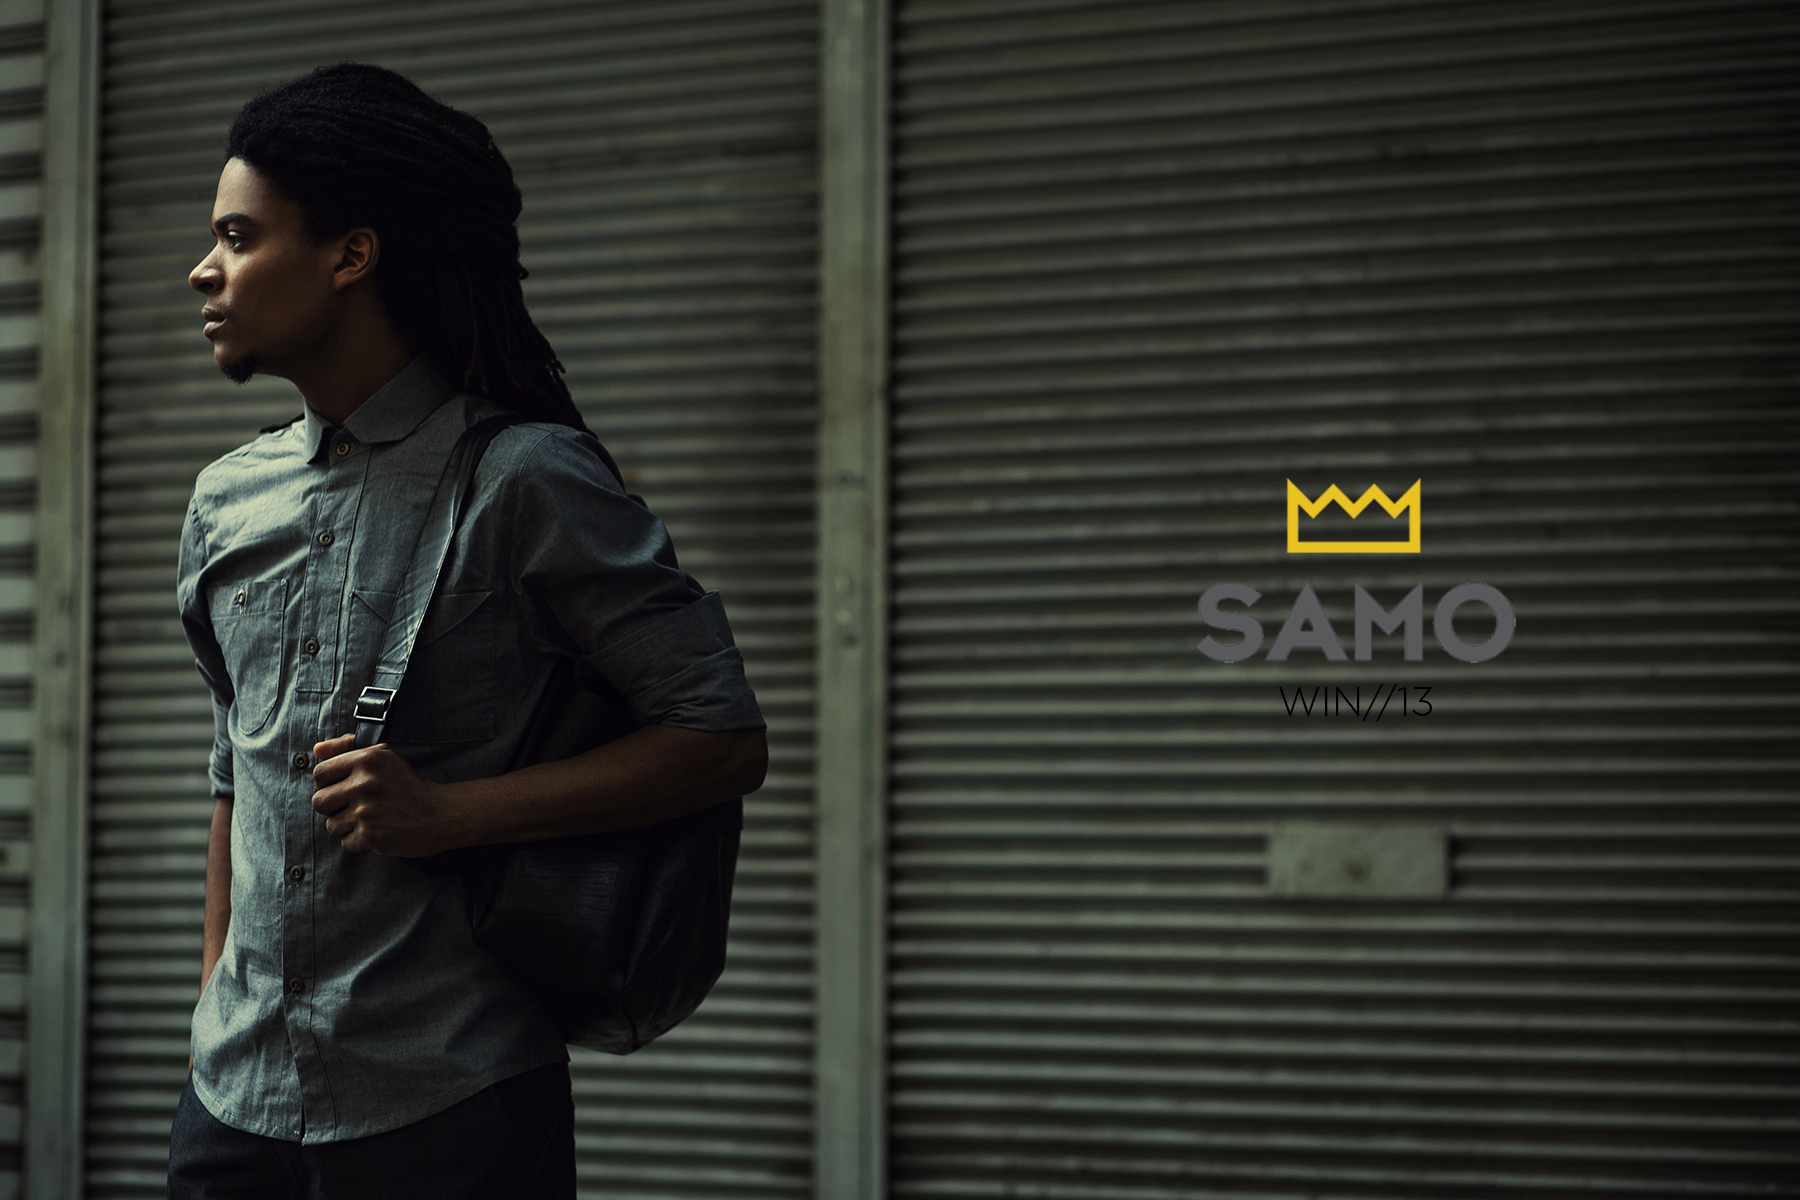 SAMO - winter13